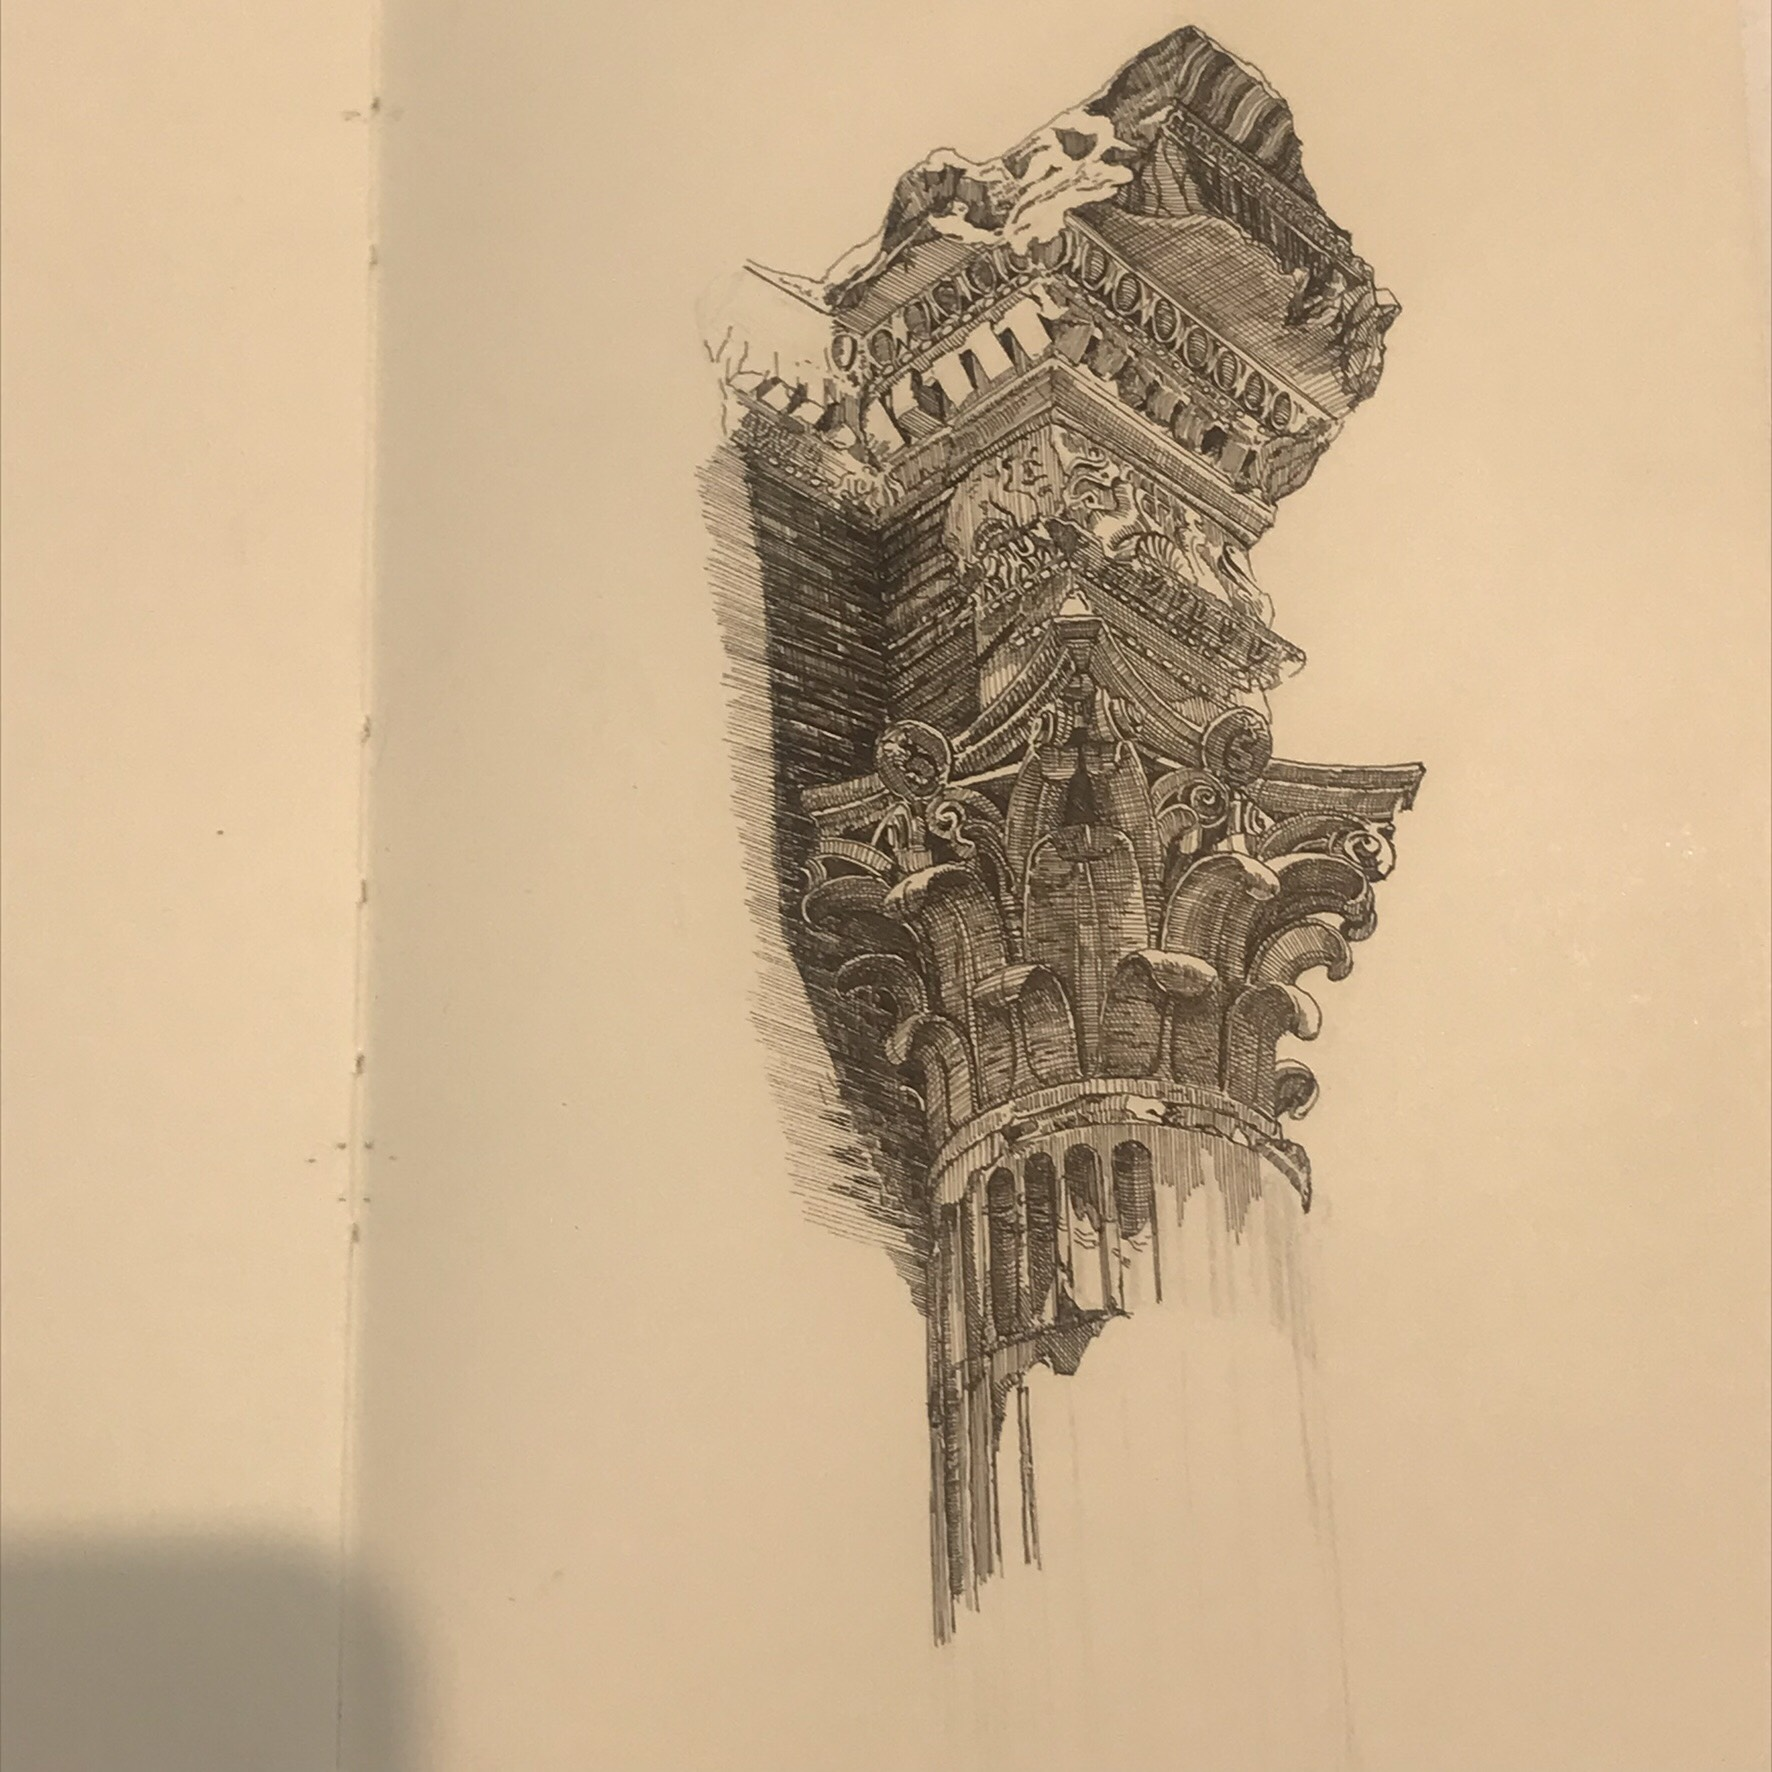 Sketchbook by Vi Luong. (Milene Fernandez/The Epoch Times)